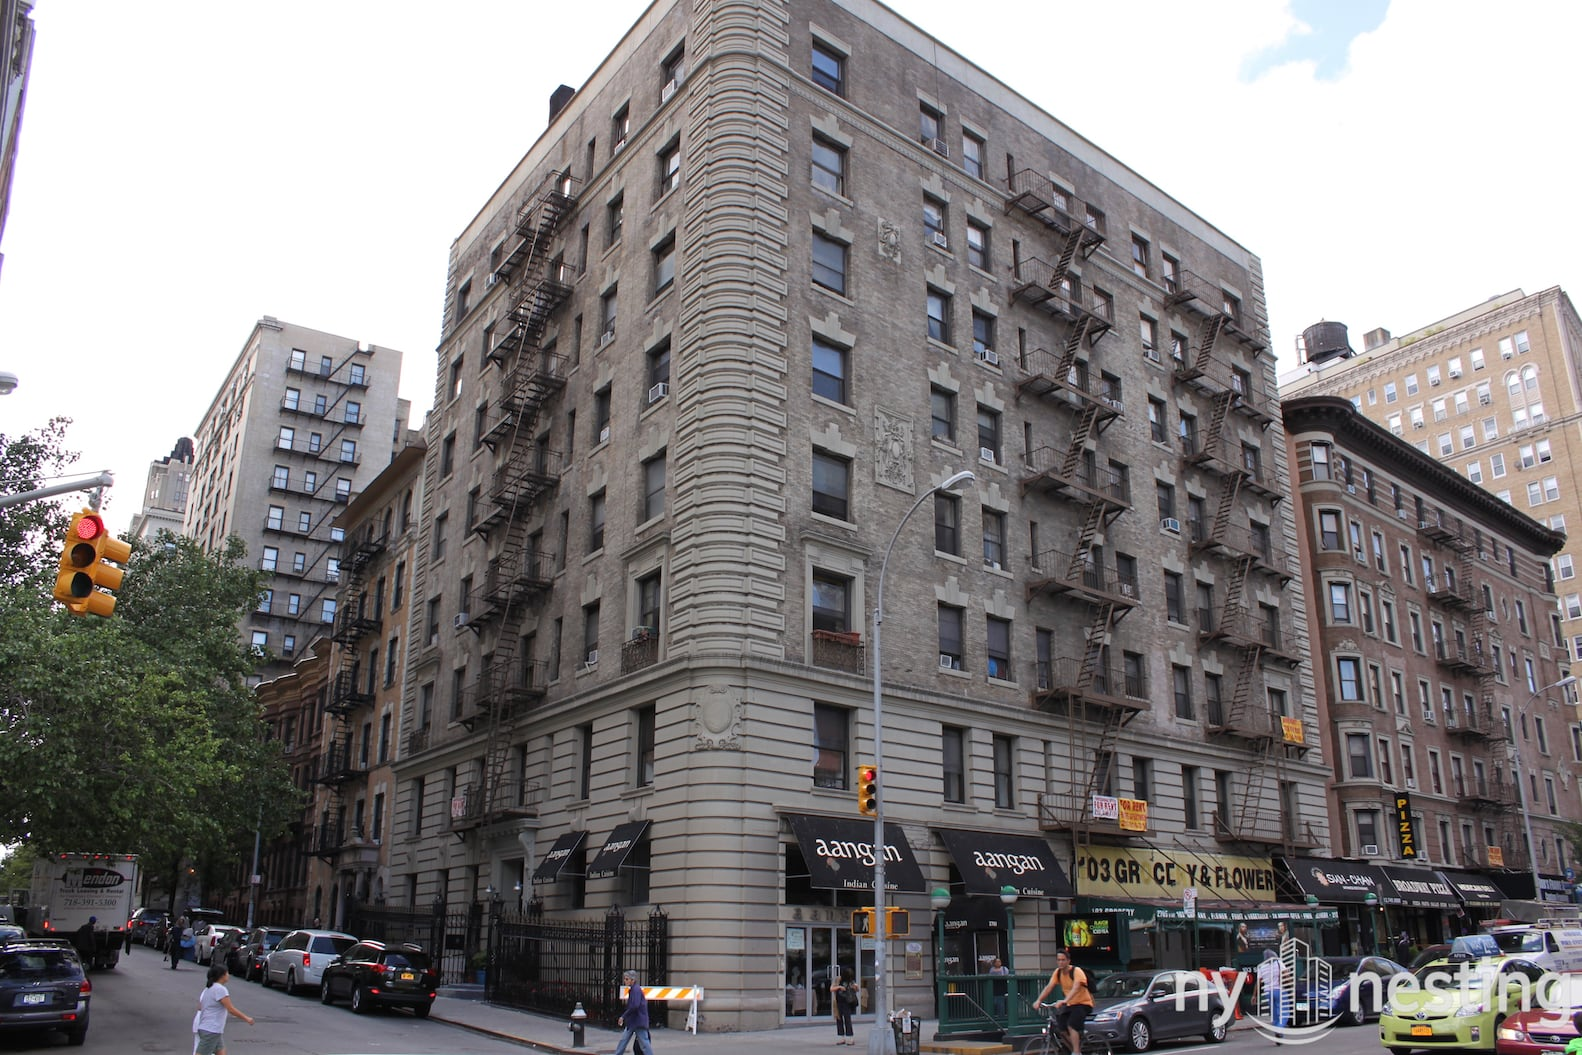 235 west 103rd street upper west side manhattan scout for Apartments upper west side manhattan